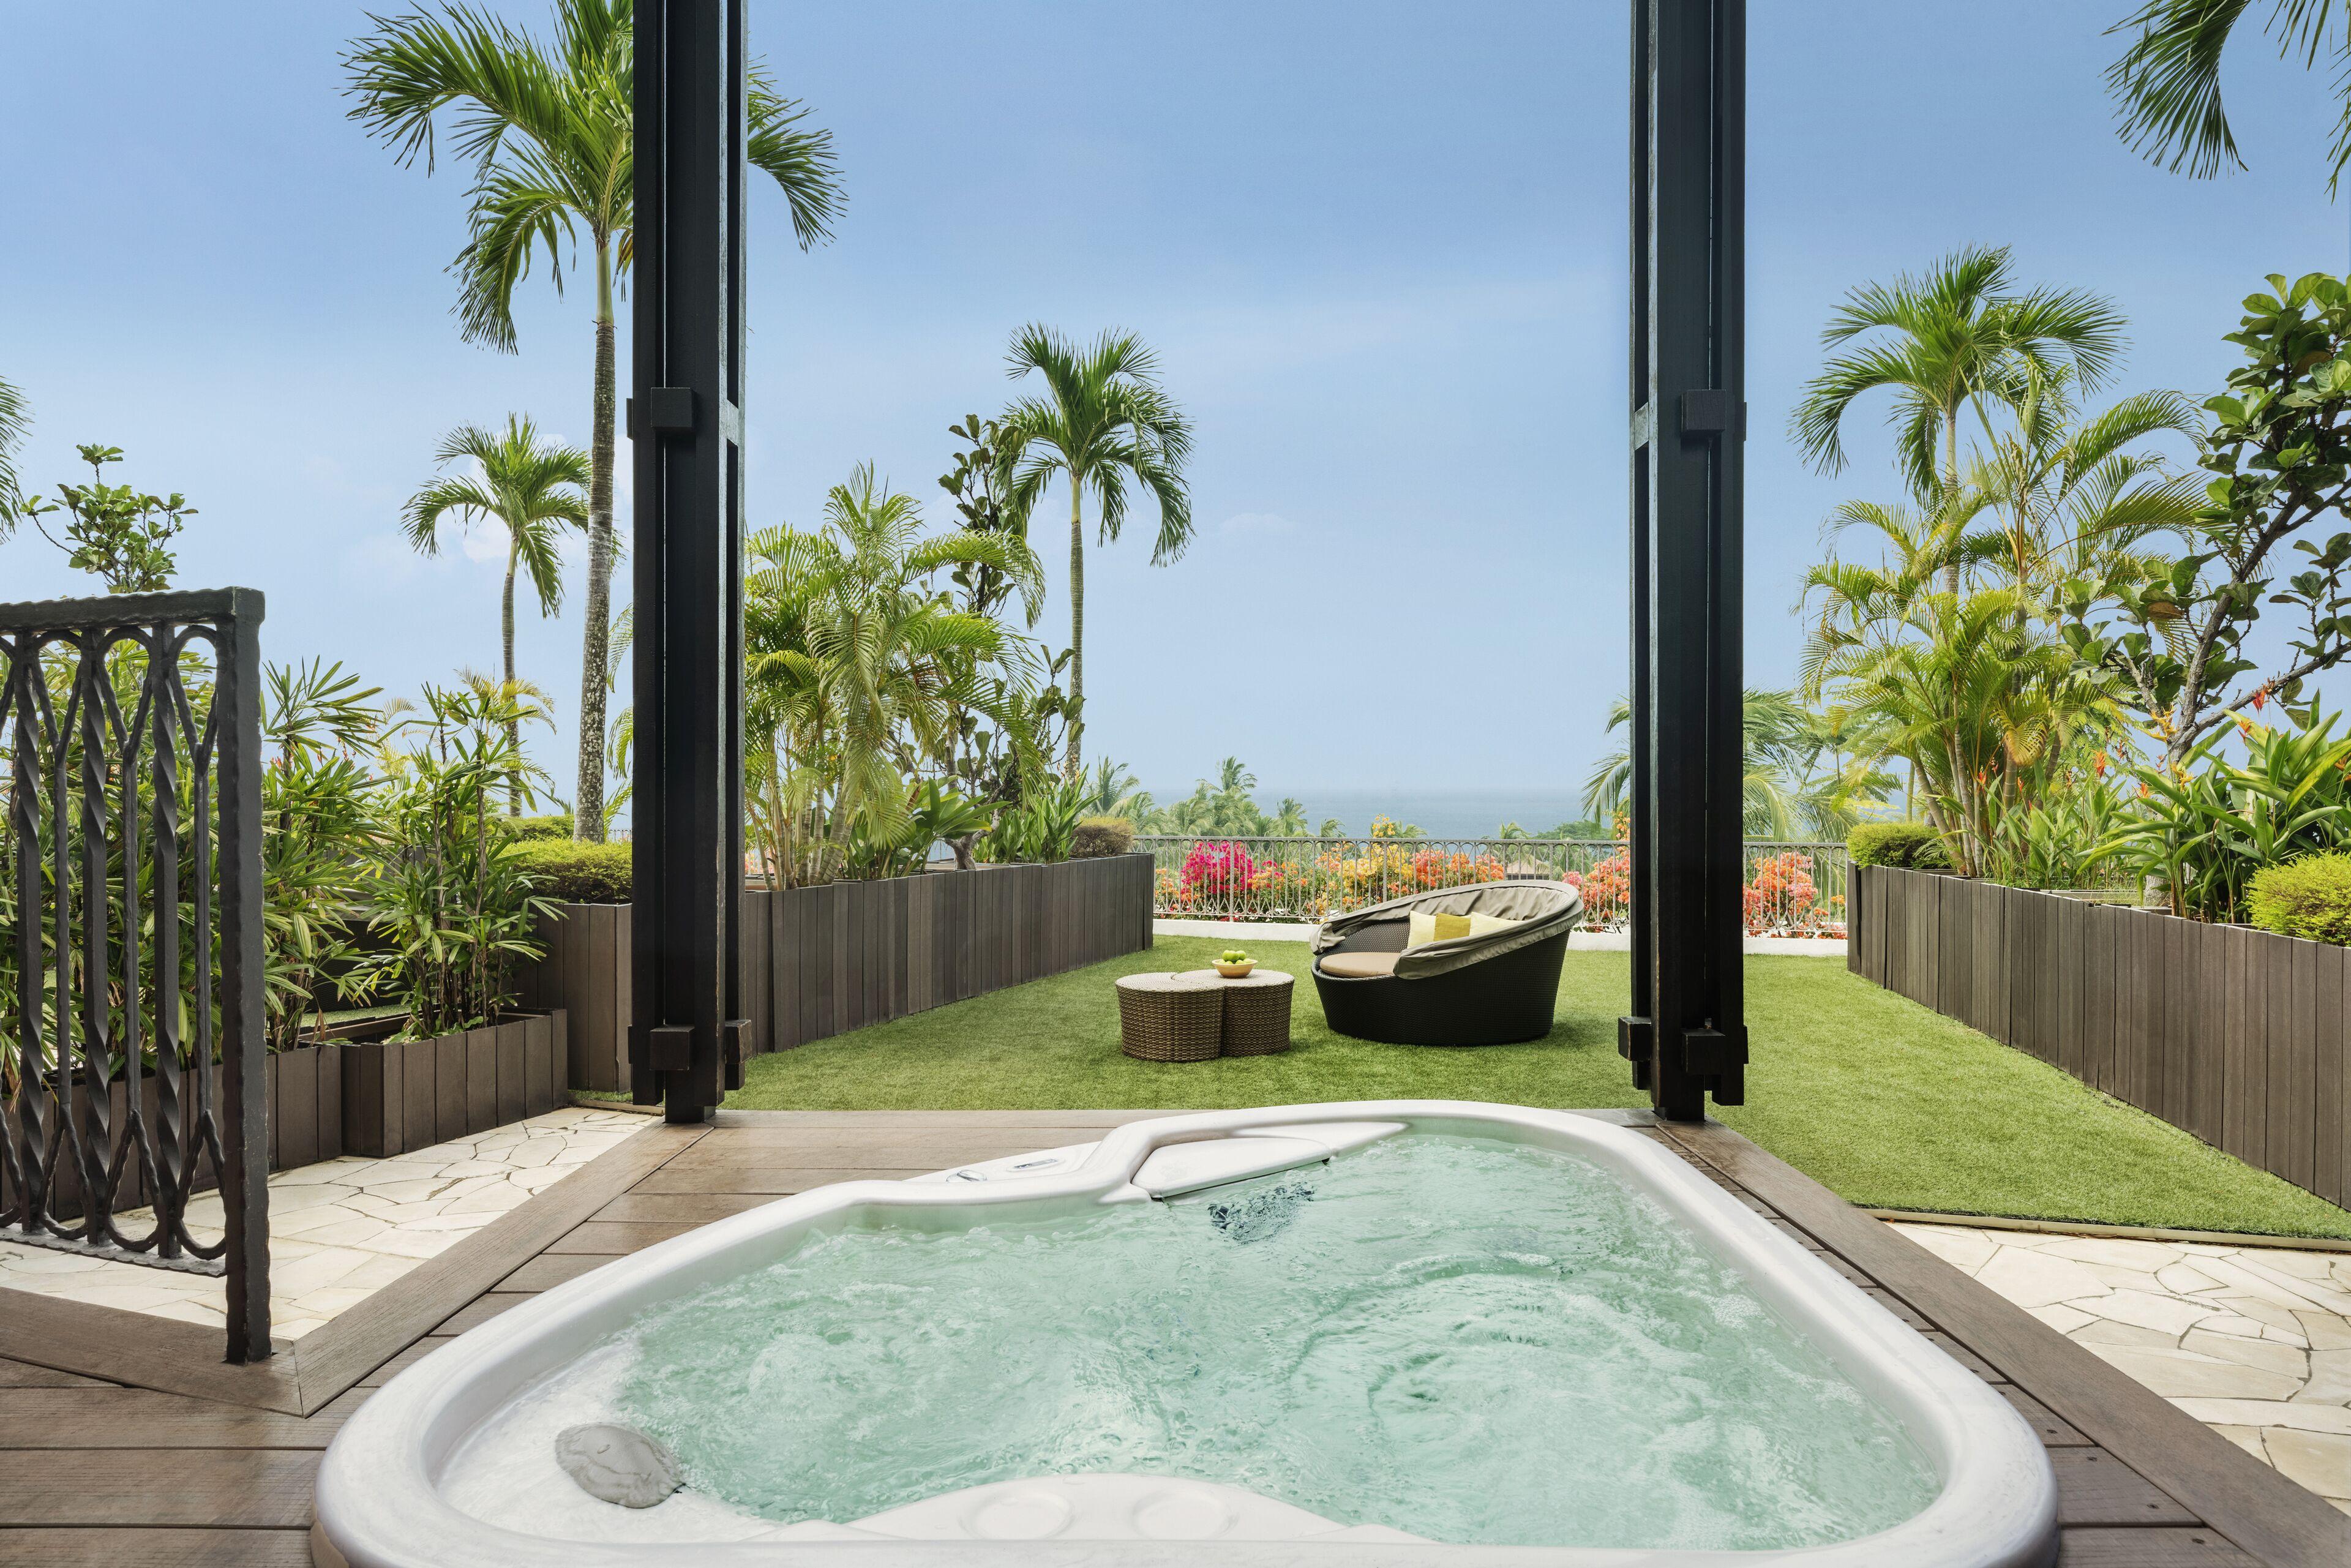 Courtesy of Shangri-La's Rasa Sentosa Resort & Spa / Expedia